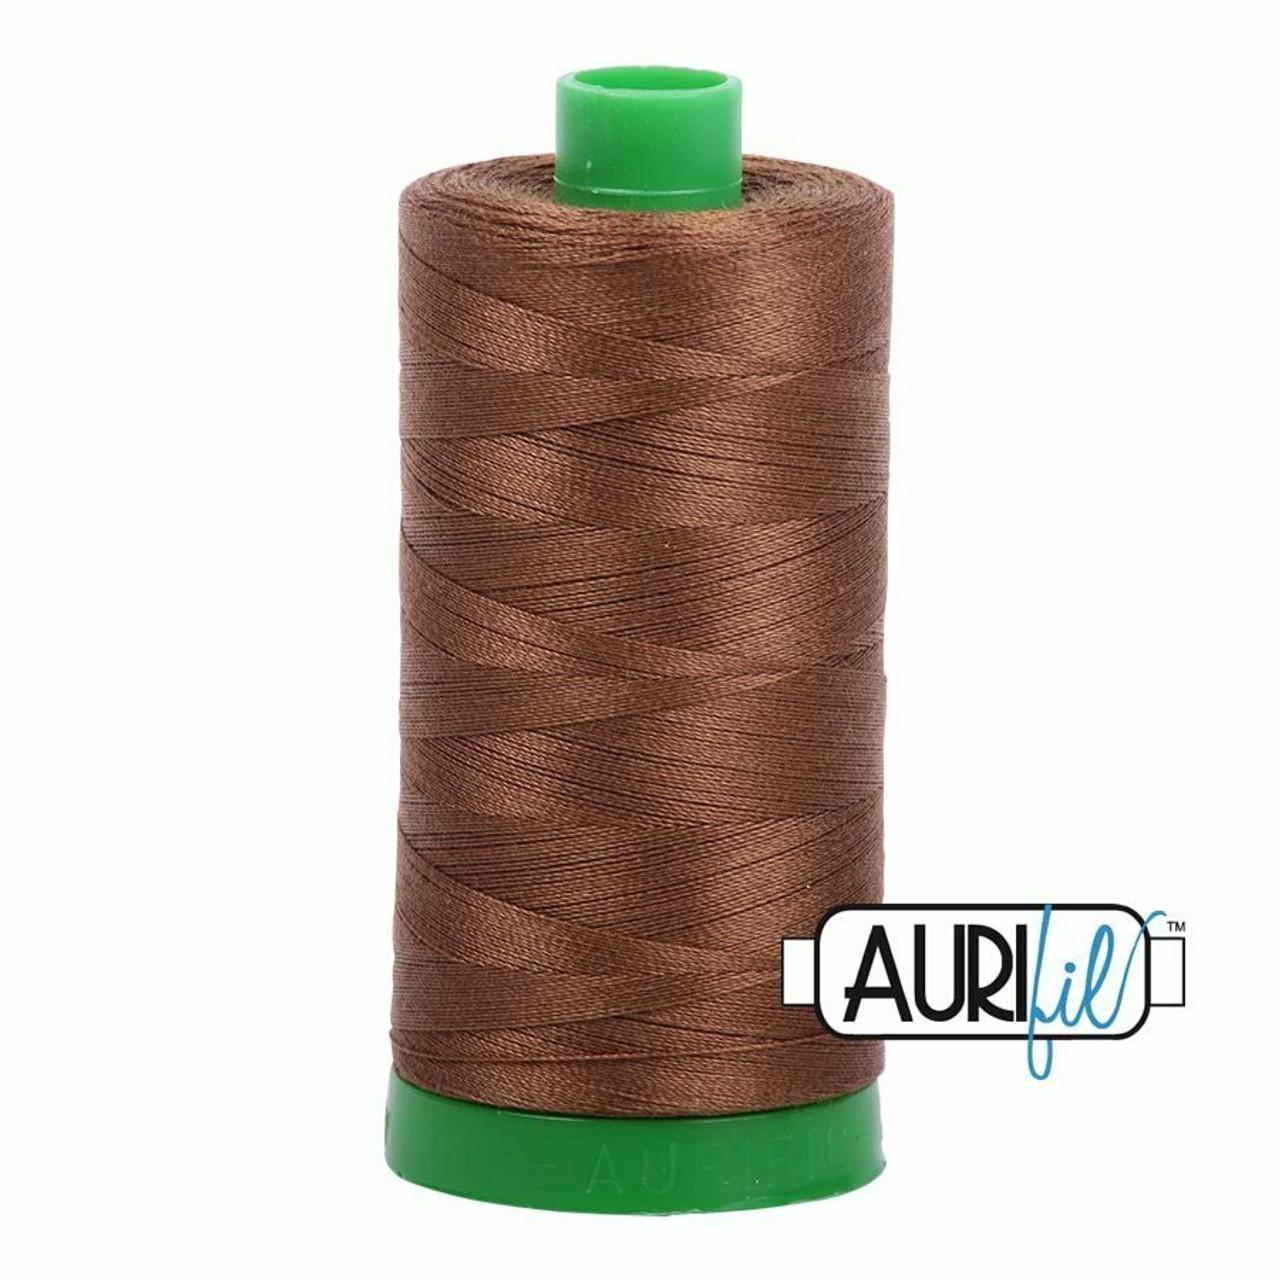 Aurifil 40wt Dark Antique Gold (2372) thread